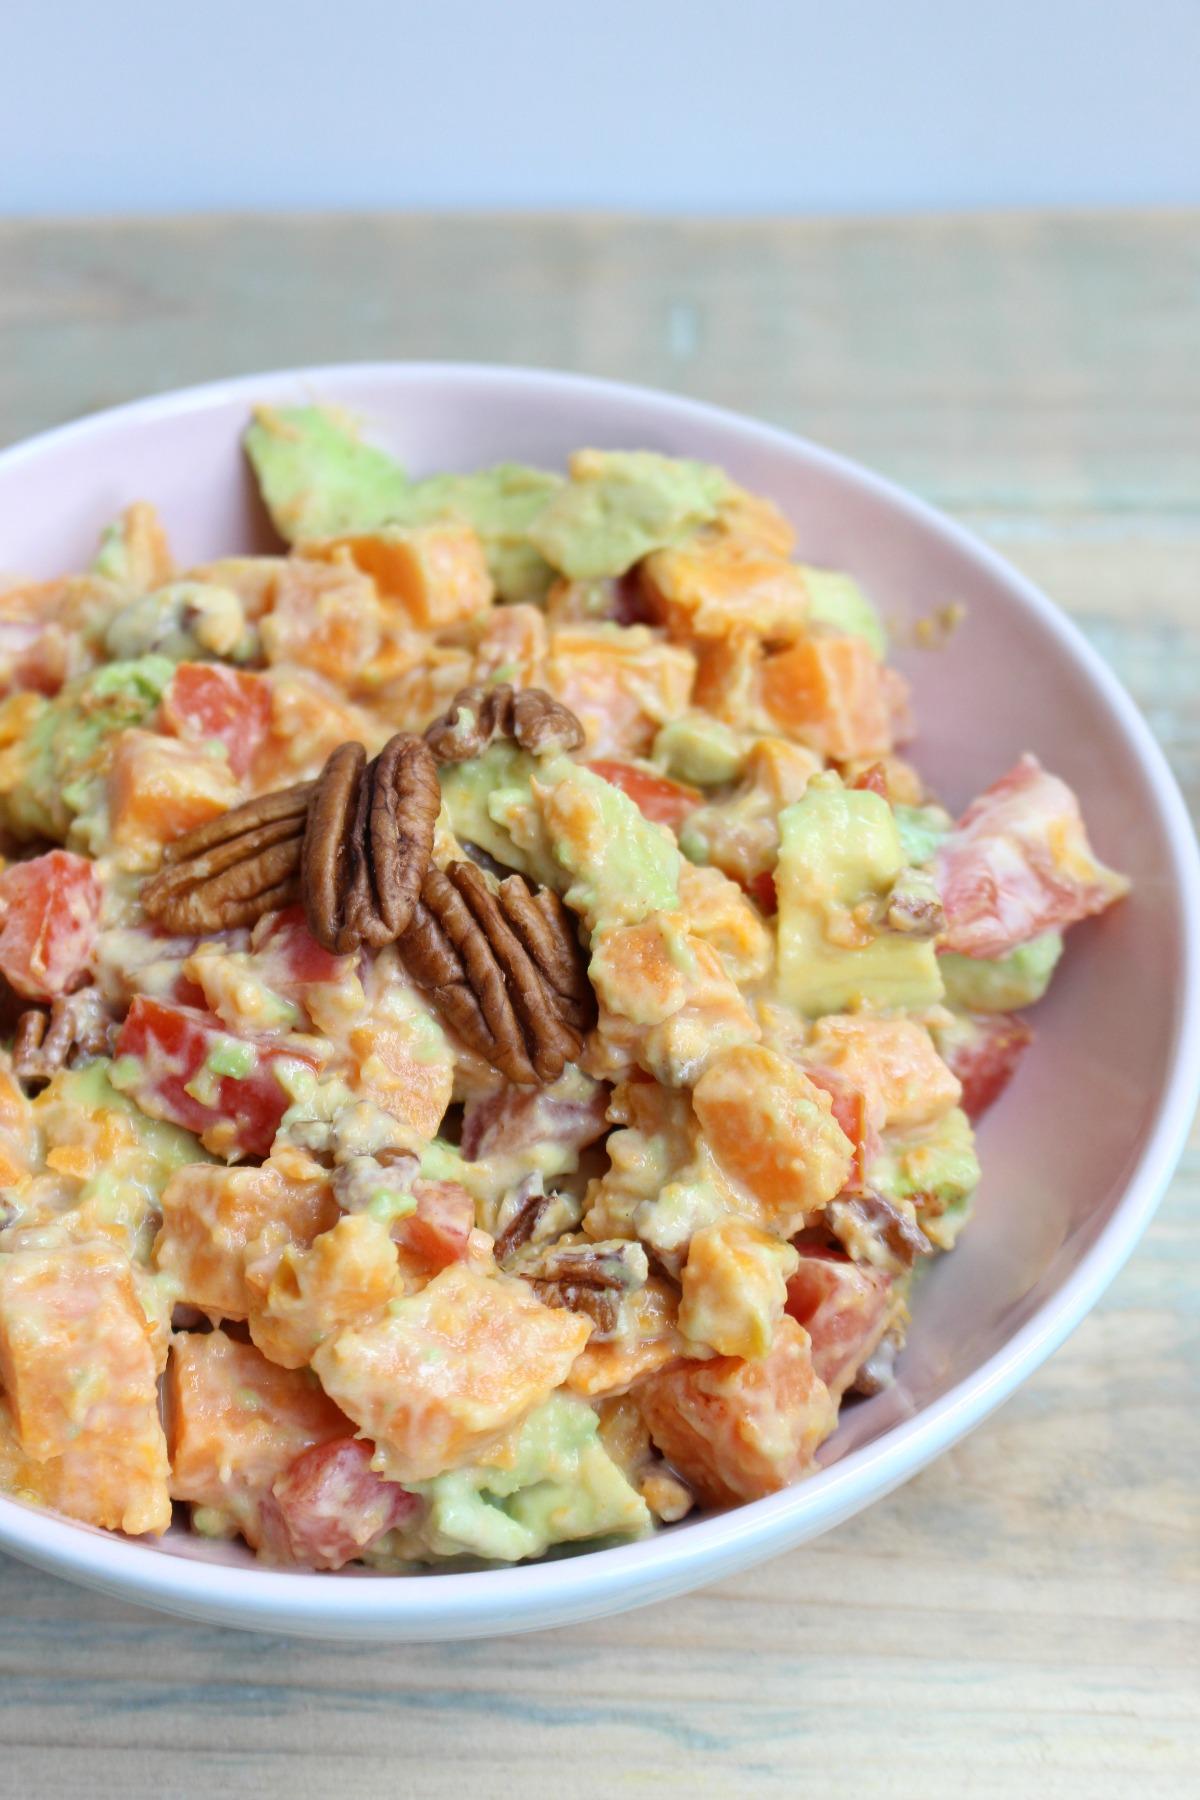 Zoete aardappel – avocado slaatje